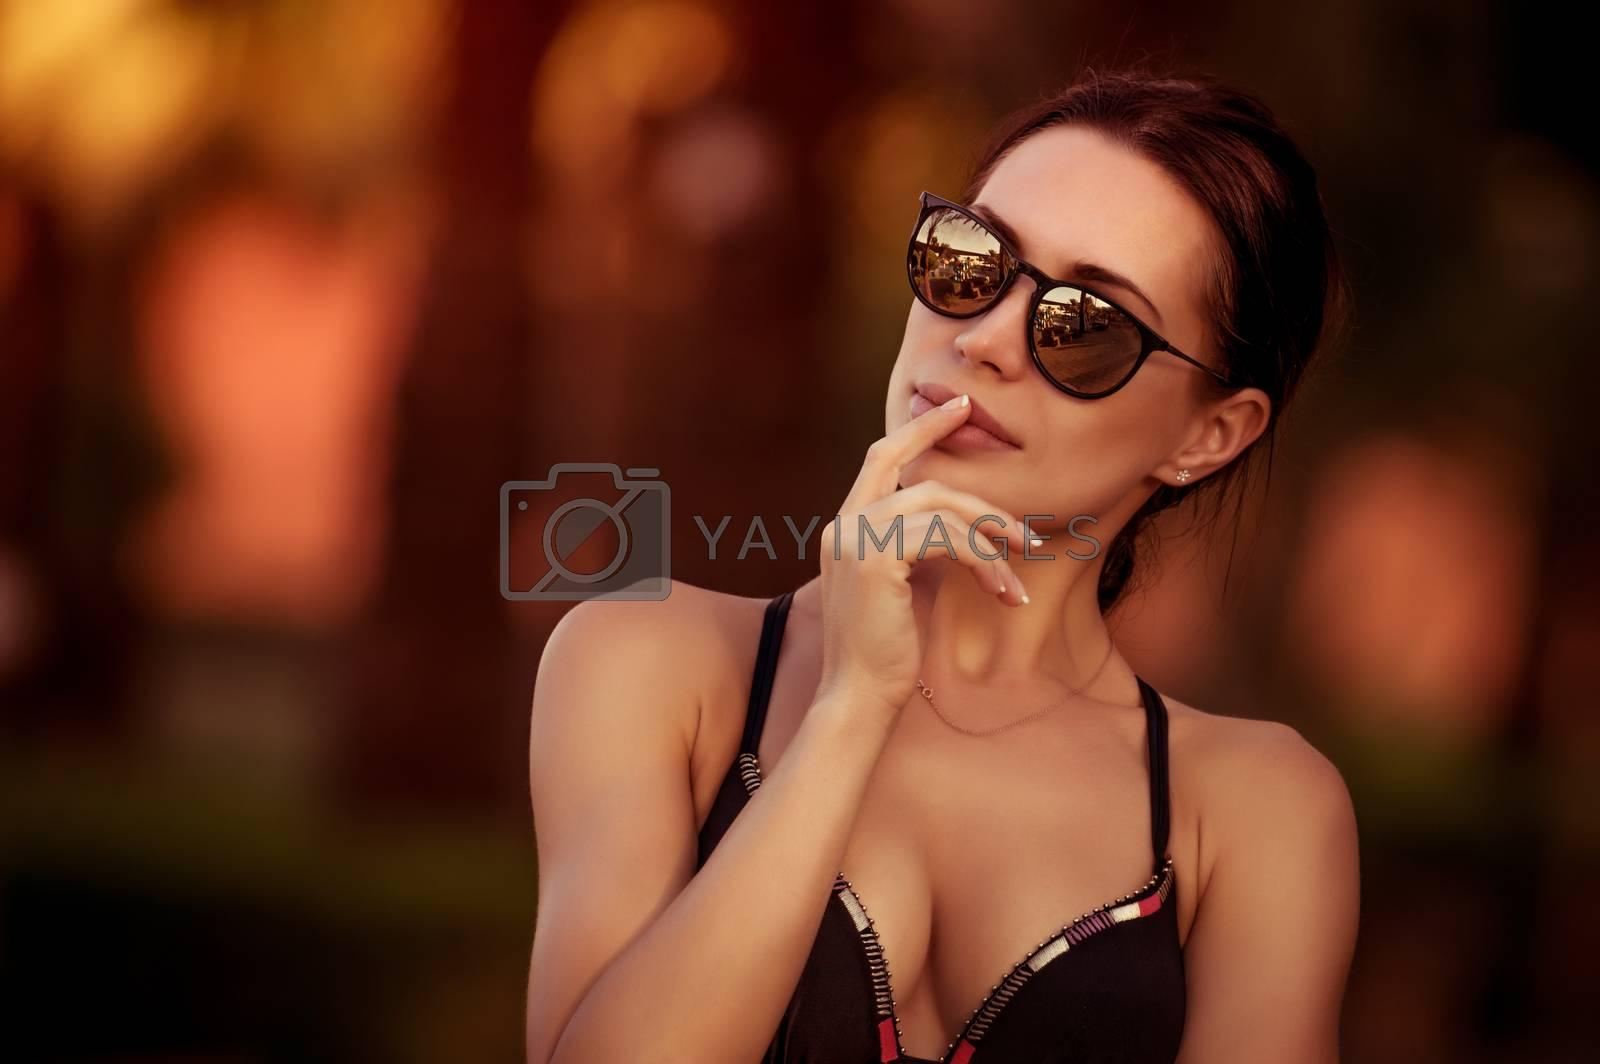 Fashion woman portrait, beautiful woman wearing stylish sunglasses and swimsuit, gorgeous female model outdoors, summer vacation look